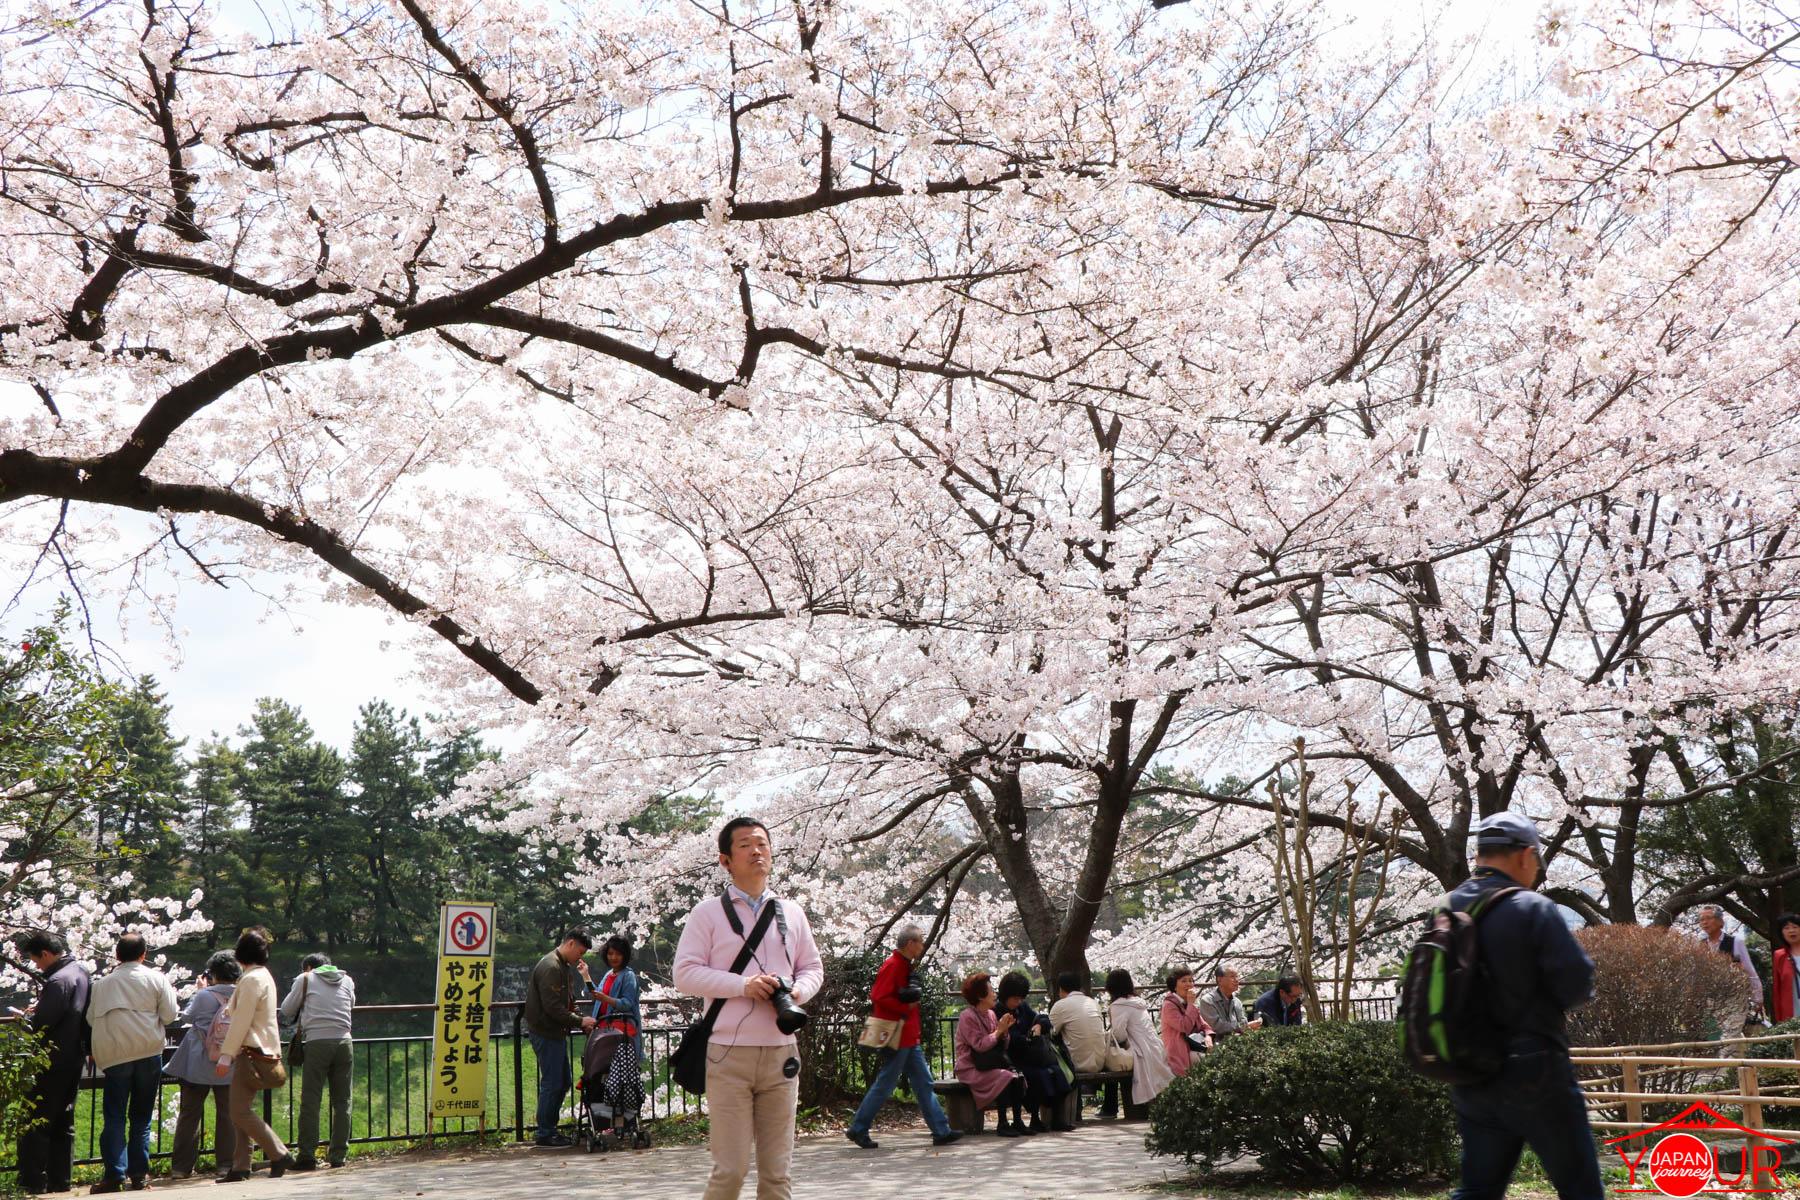 Japan Cherry Blossom Forecast 2019 - Chidorigafuchi Park